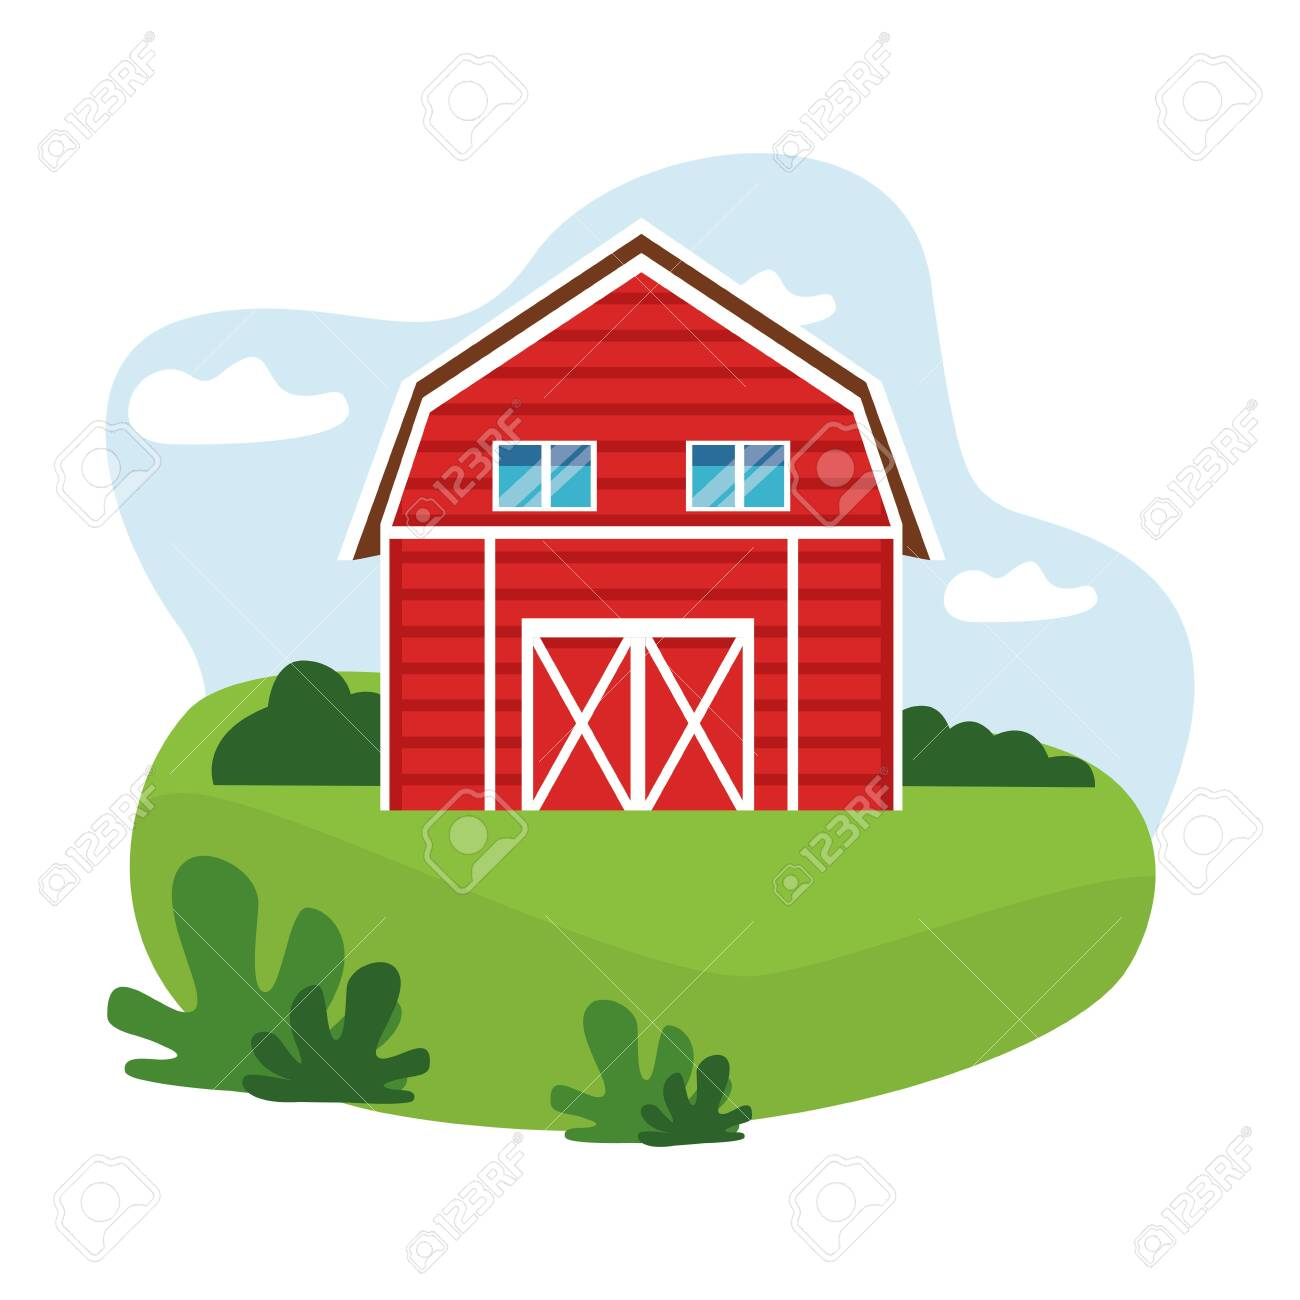 Farm Animals And Farmer Barn Icon Cartoon Over The Grass With